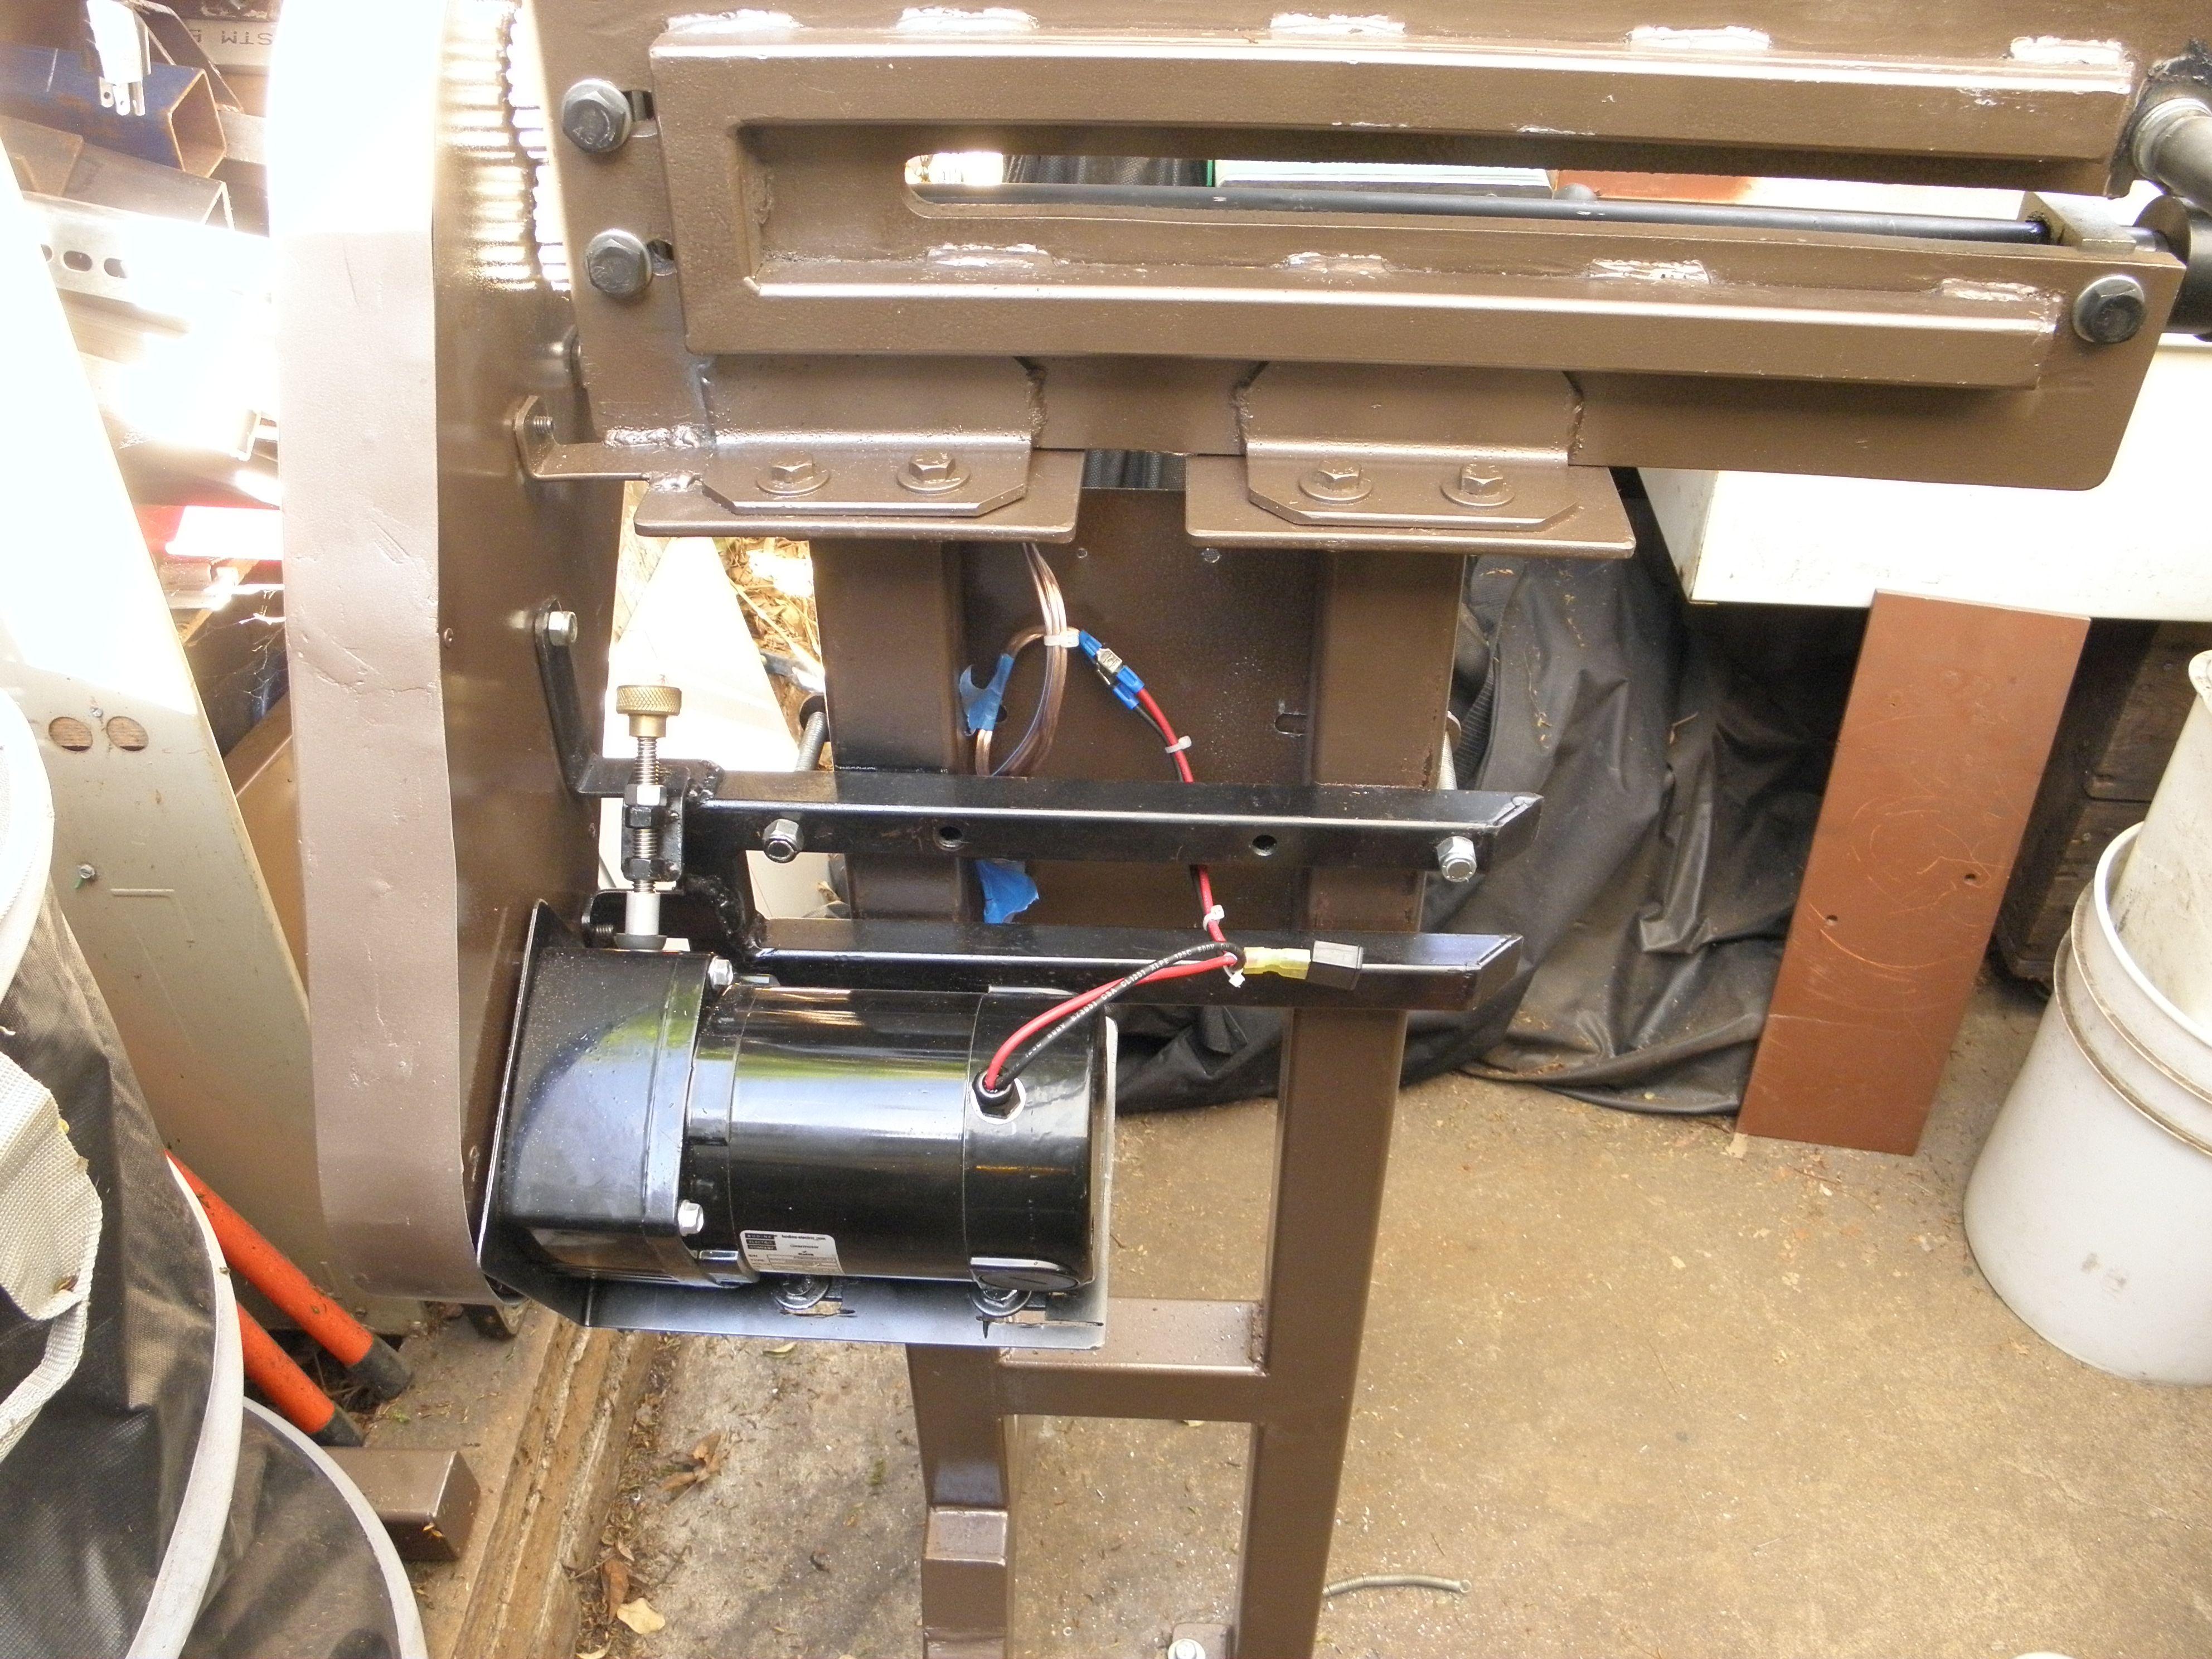 Bead roller diy | DIY TOOLS | Sheet metal roller, Sheet